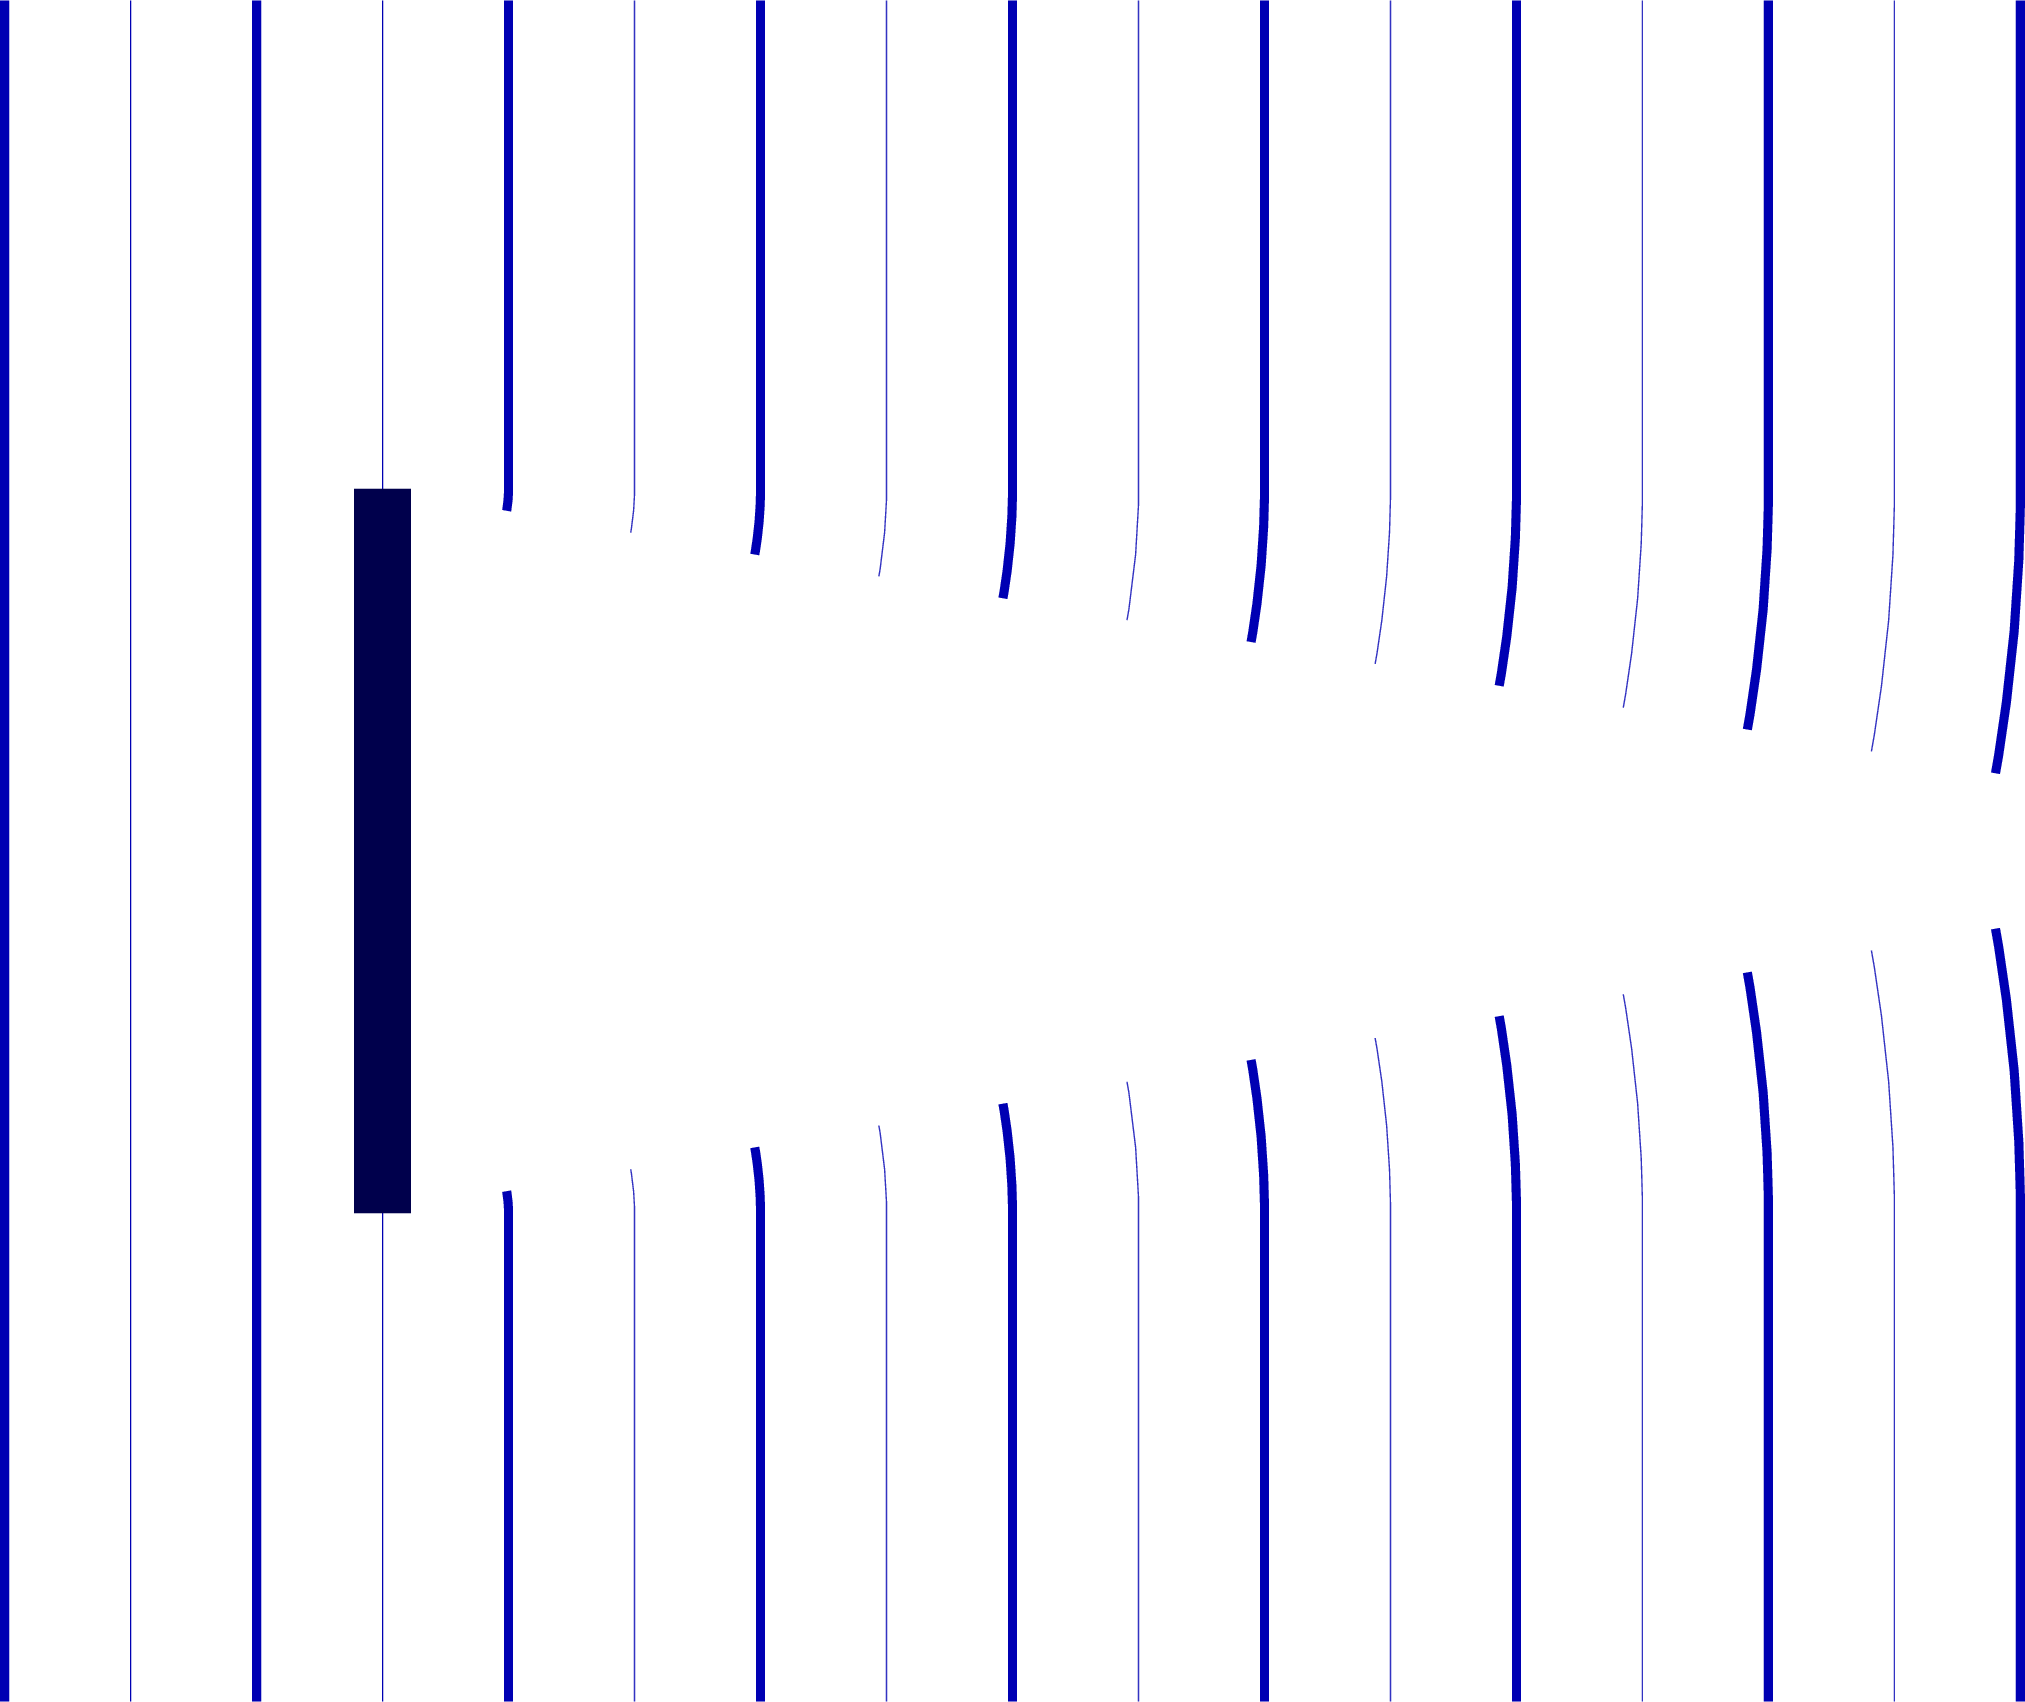 optics_diffraction-004.png